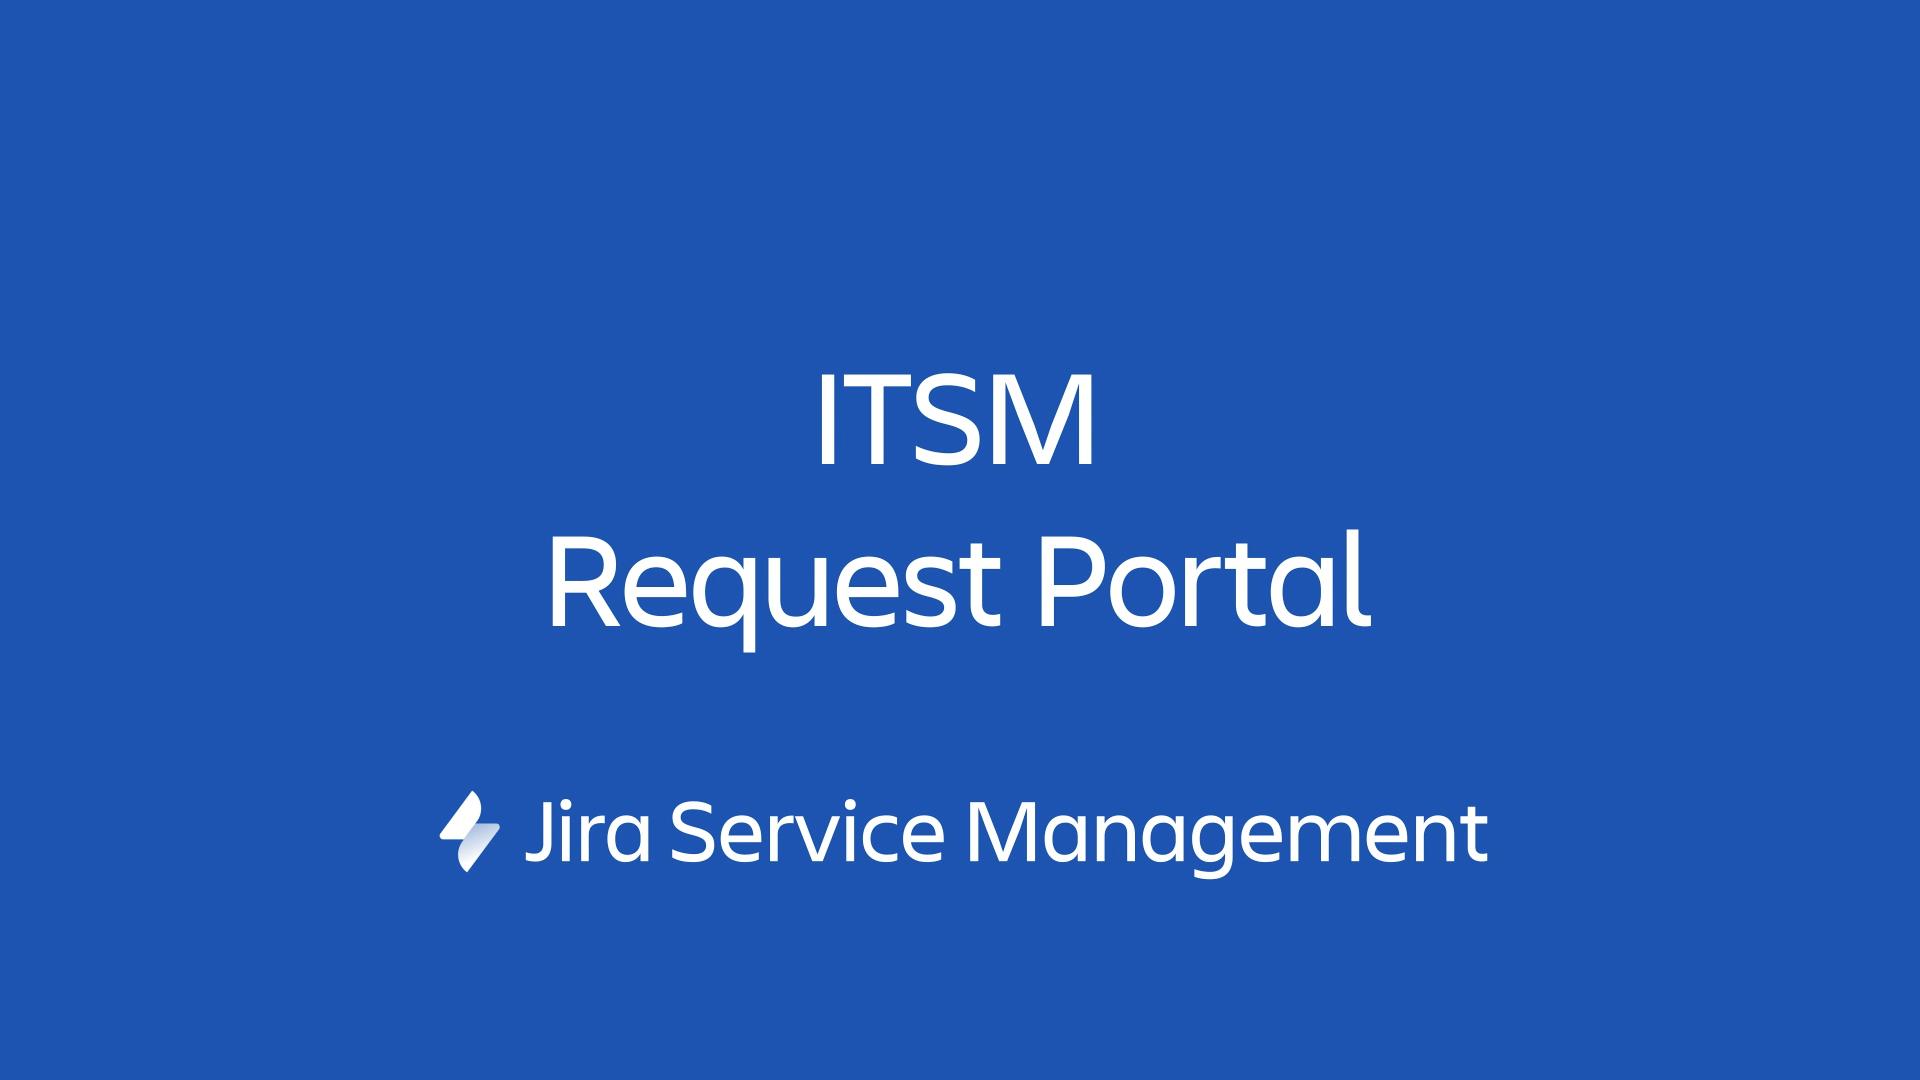 Portale delle richieste ITSM in Jira Service Management